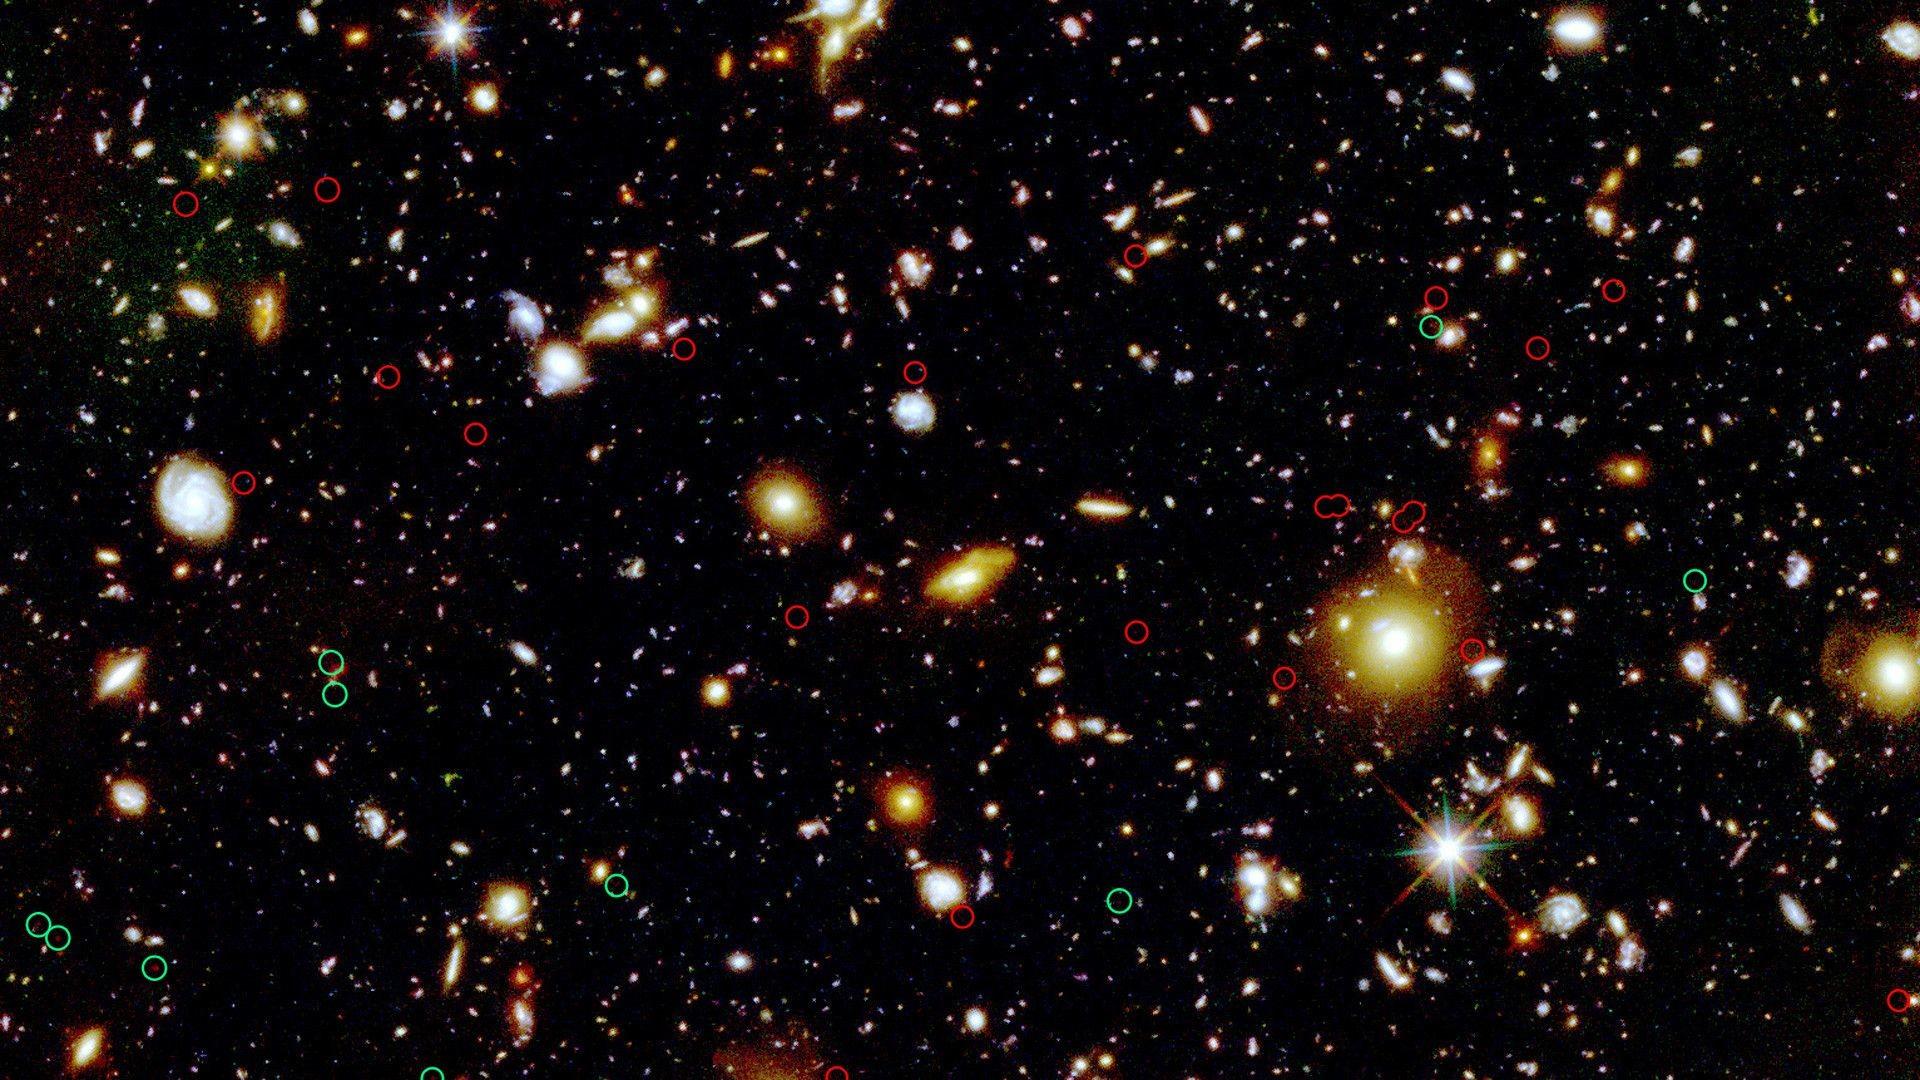 Hubble Ultra Deep Field Wallpapers – Wallpaper Cave